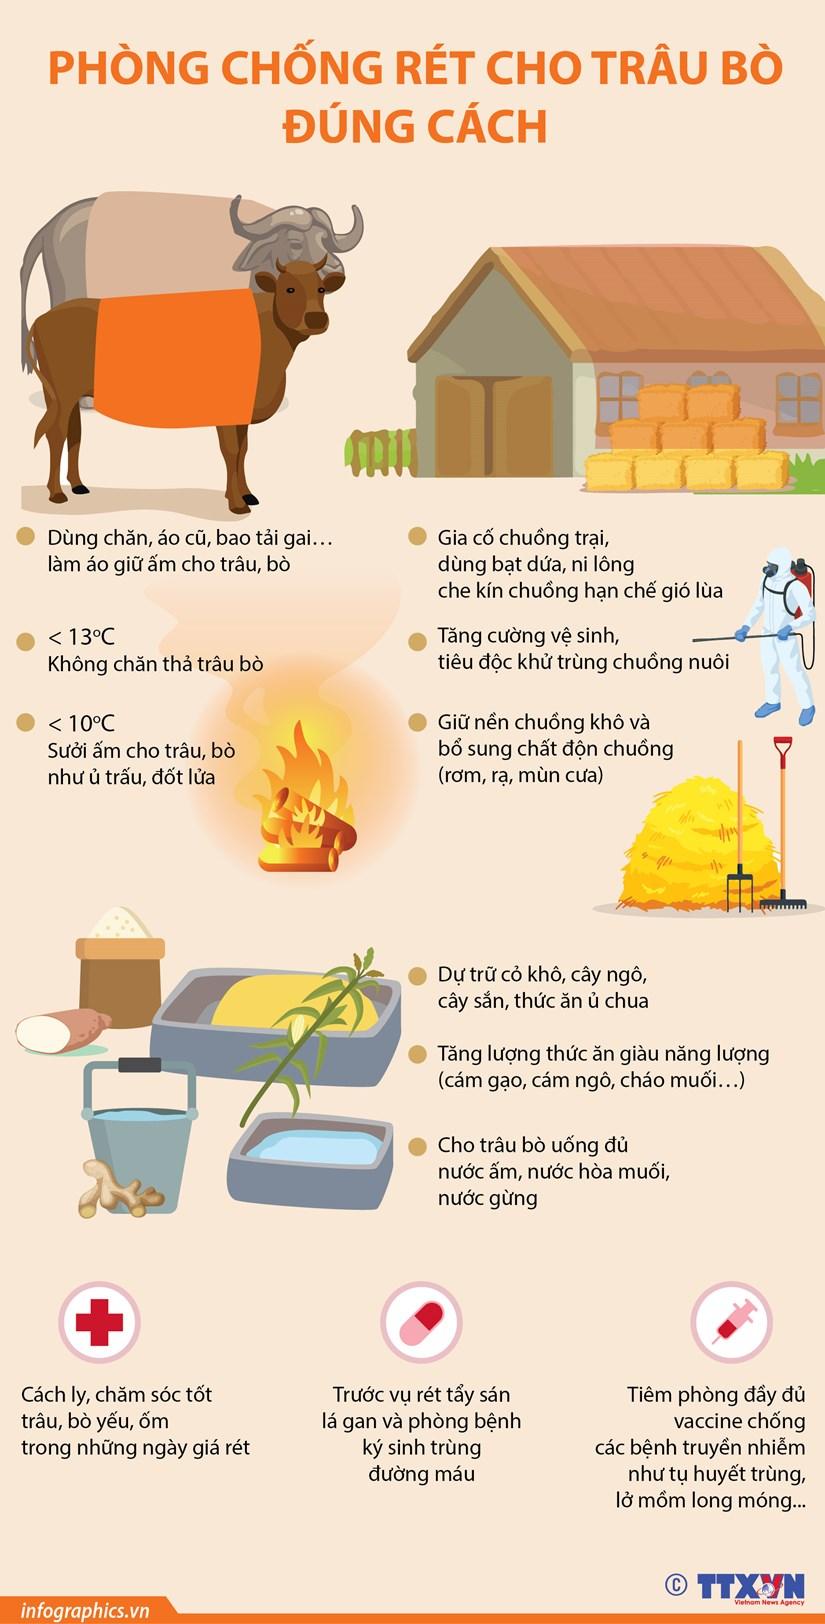 [Infographics] Cach phong chong ret cho trau bo dung cach hinh anh 1